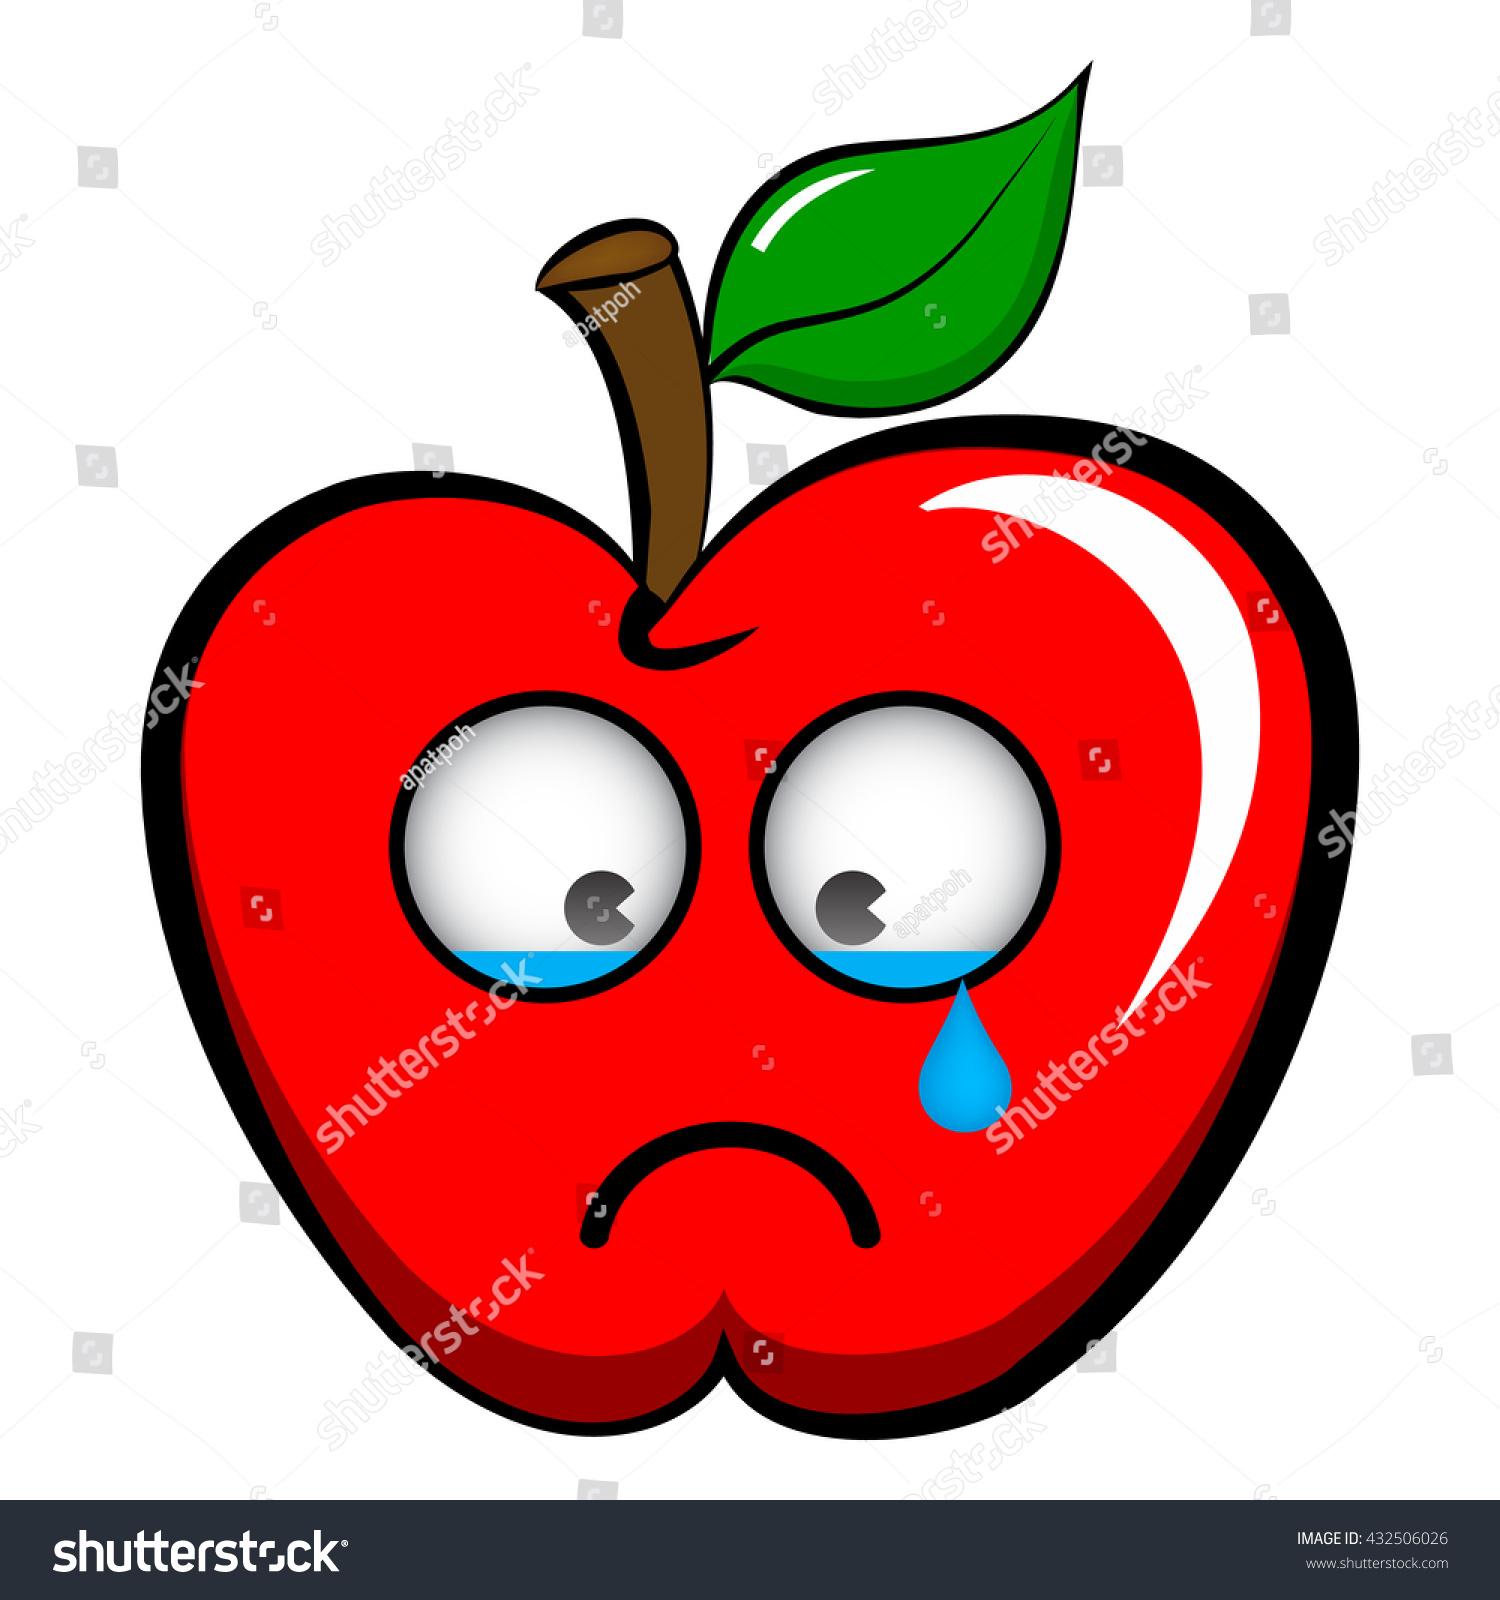 Crying apple photo